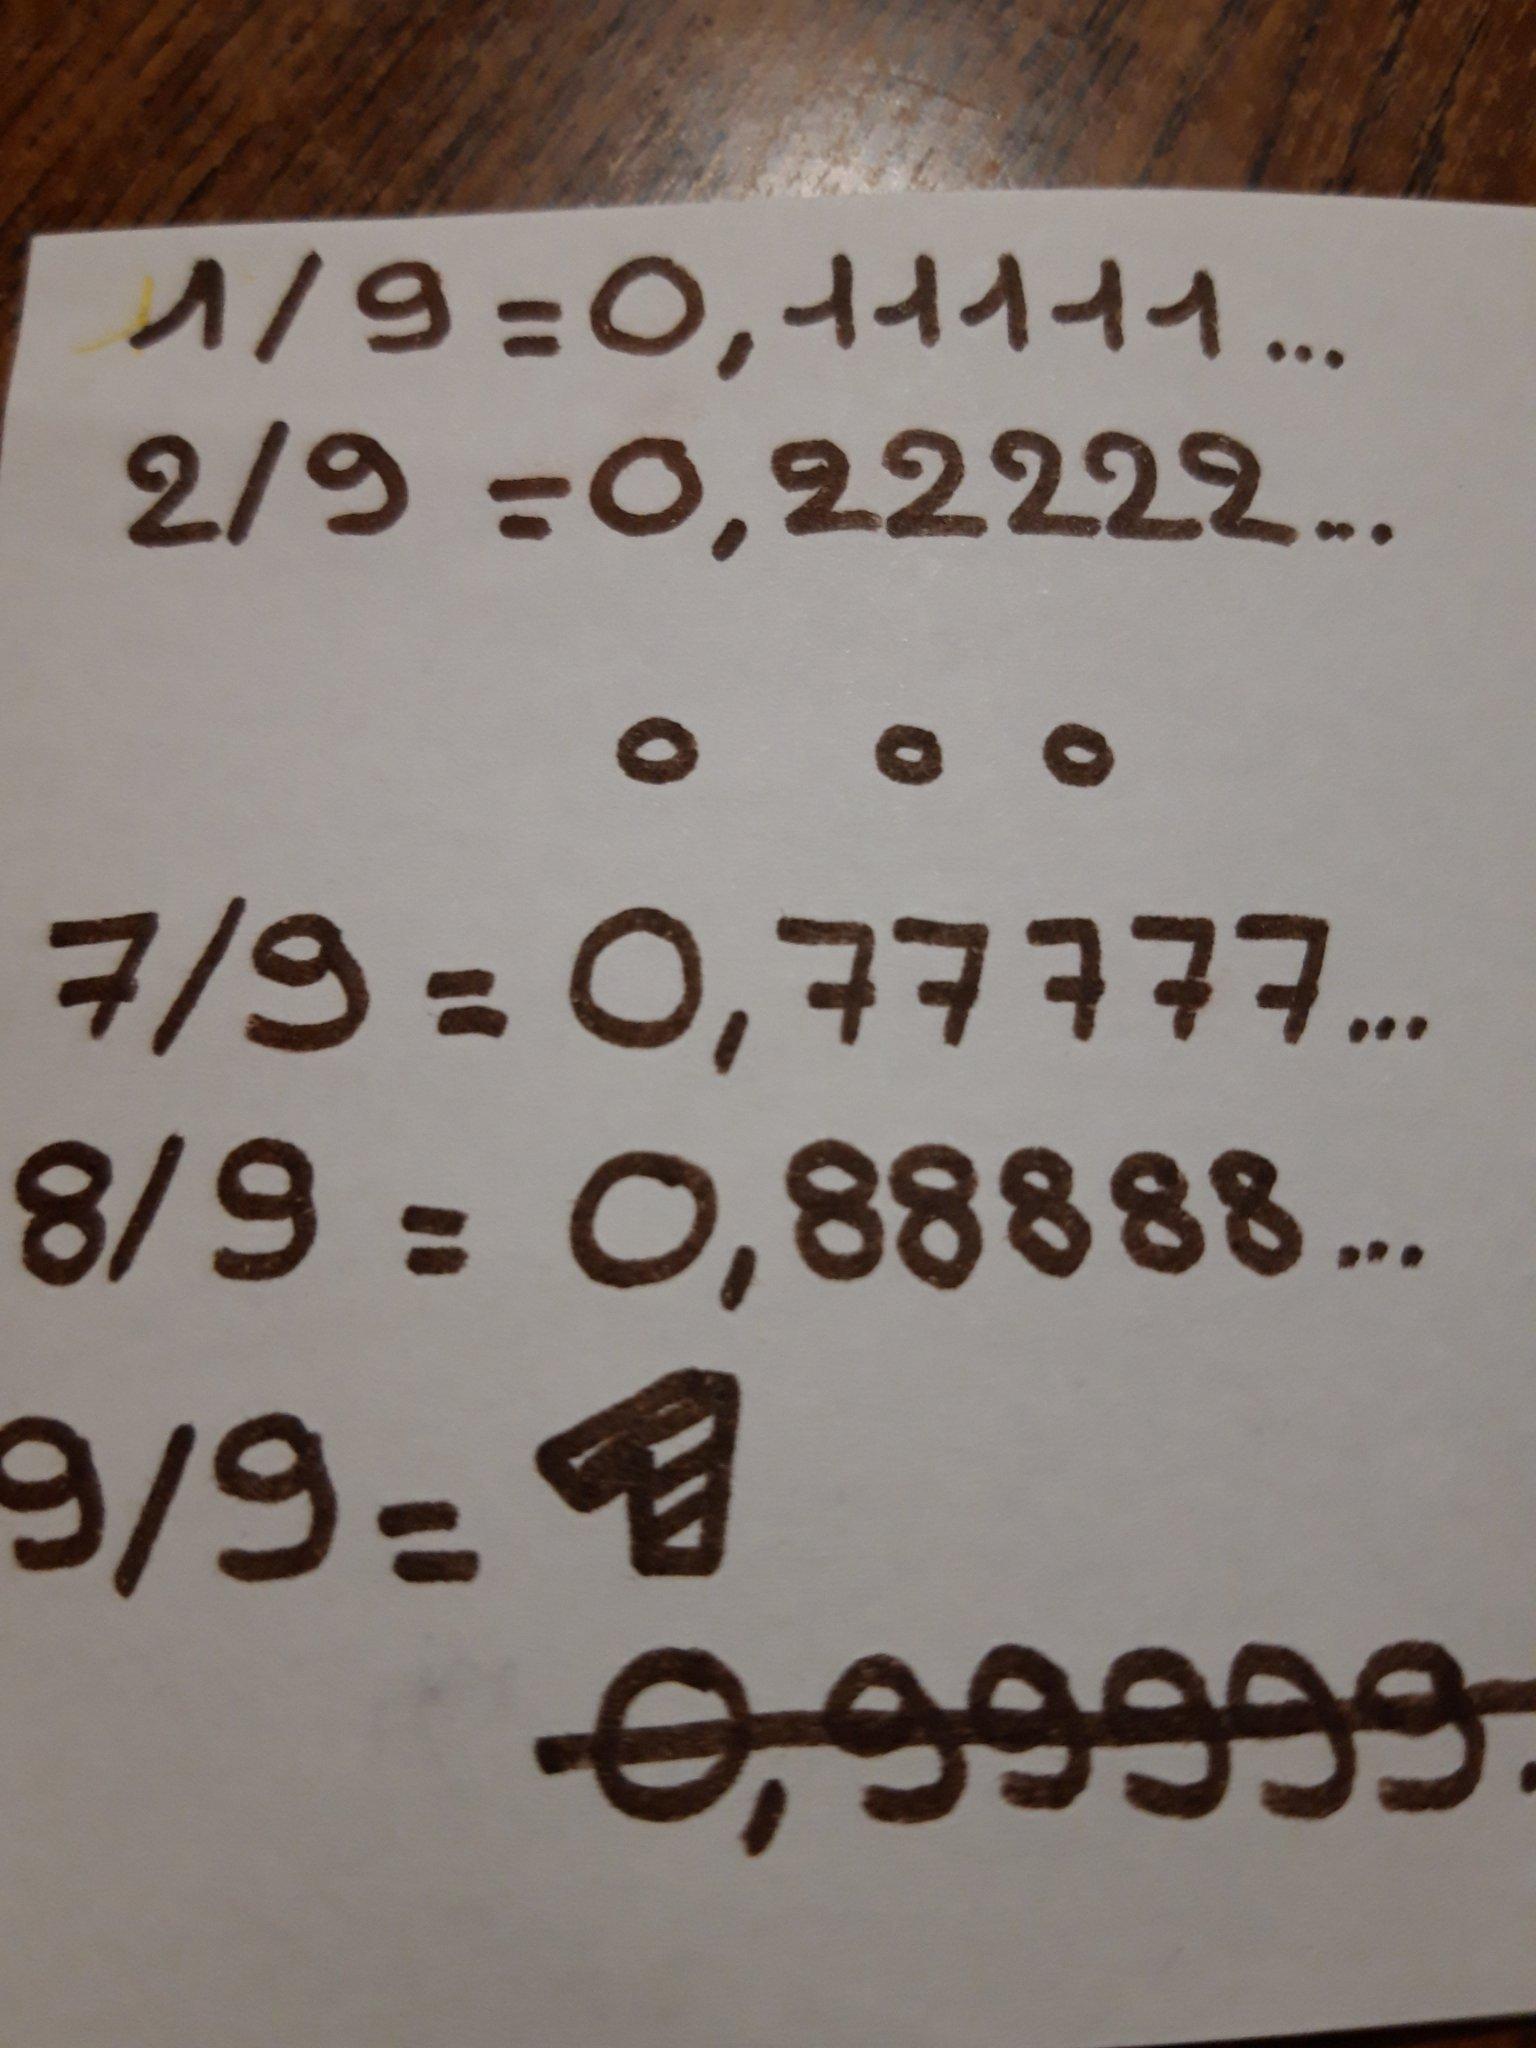 Vive les maths - meme